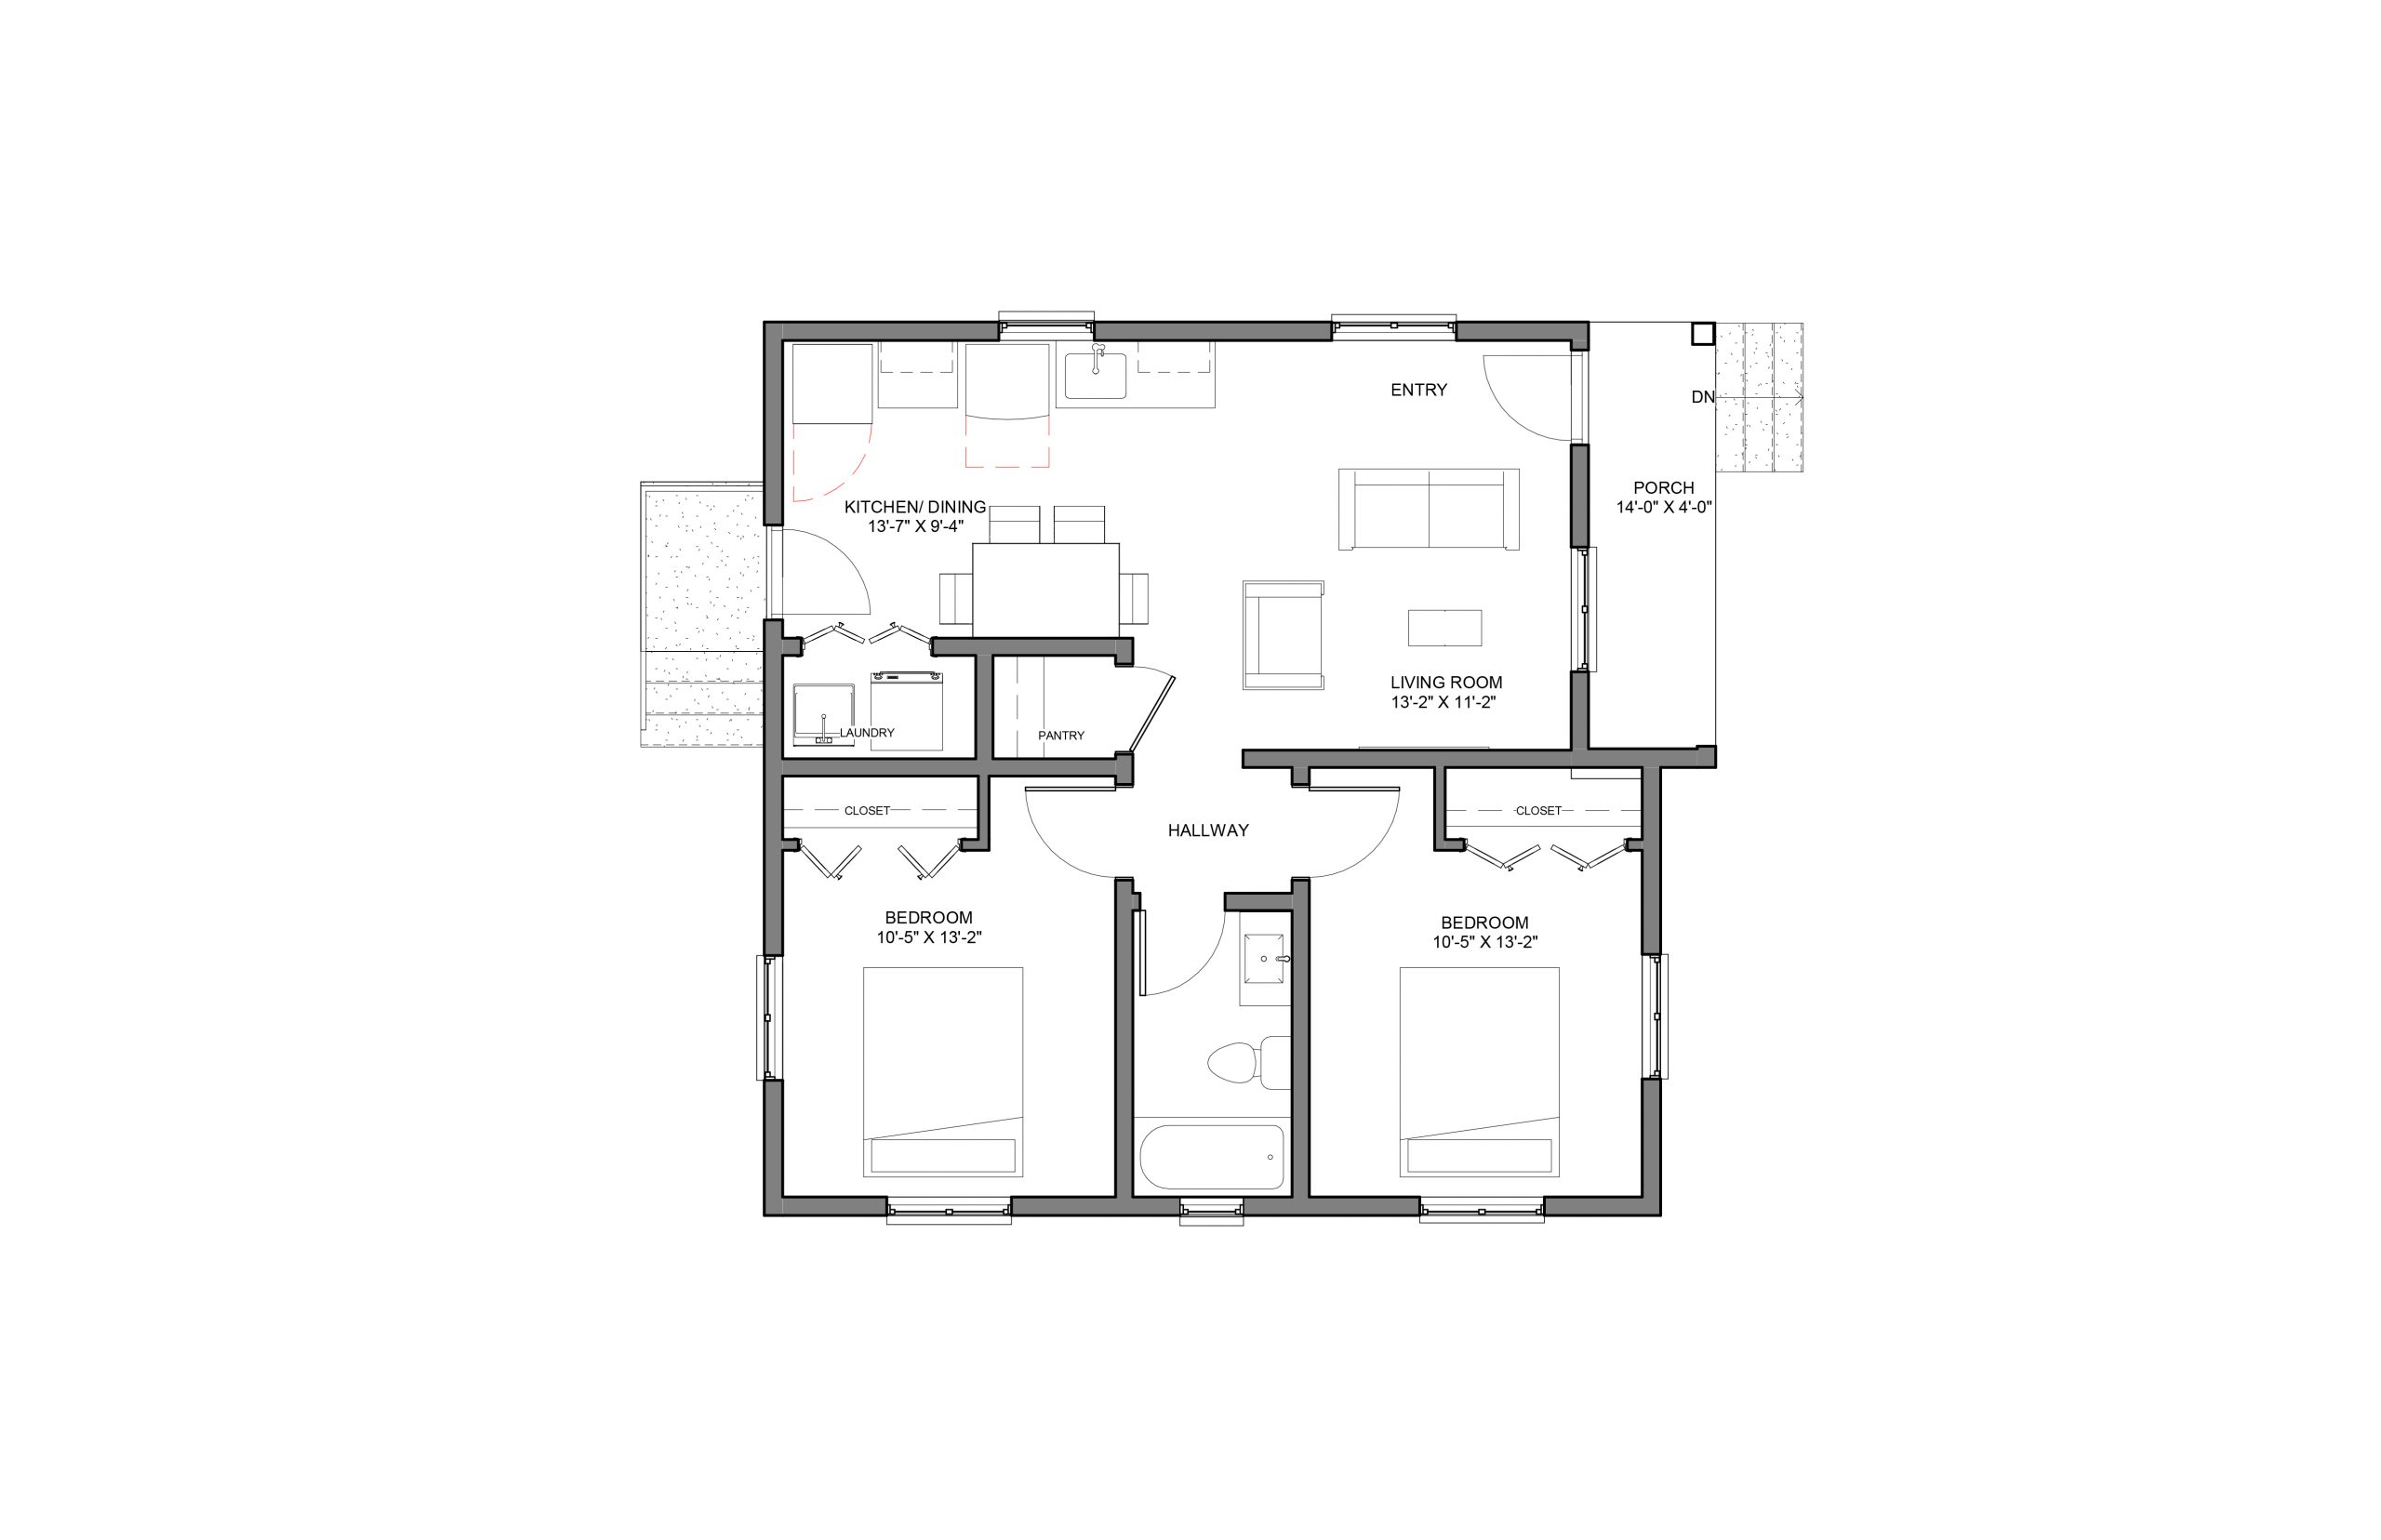 Beam 2Bed 1Bath Option 1 Floor Plan 840+SQFT